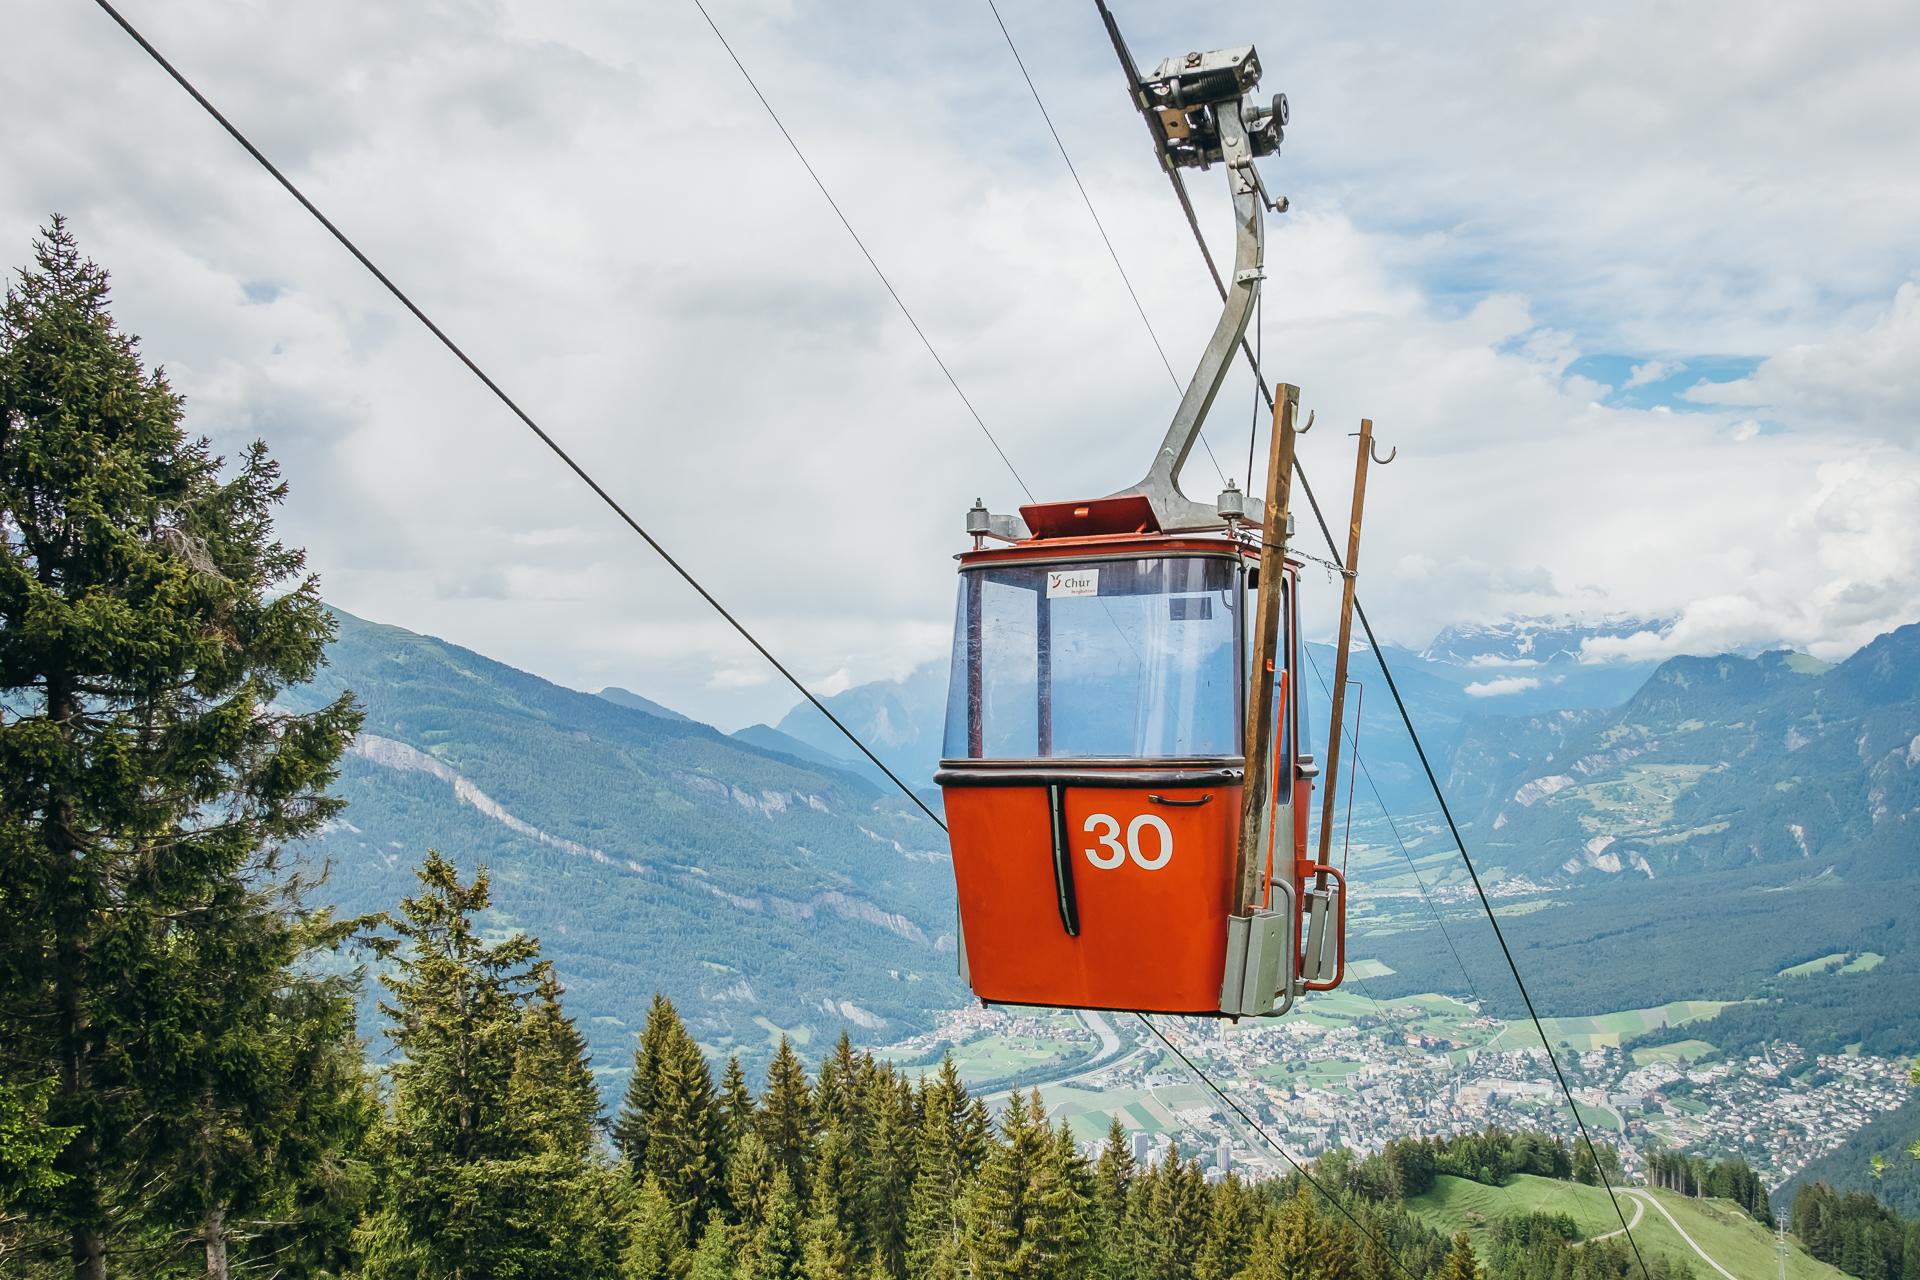 Brambuesch, Chur, Graubunden, Switzerland